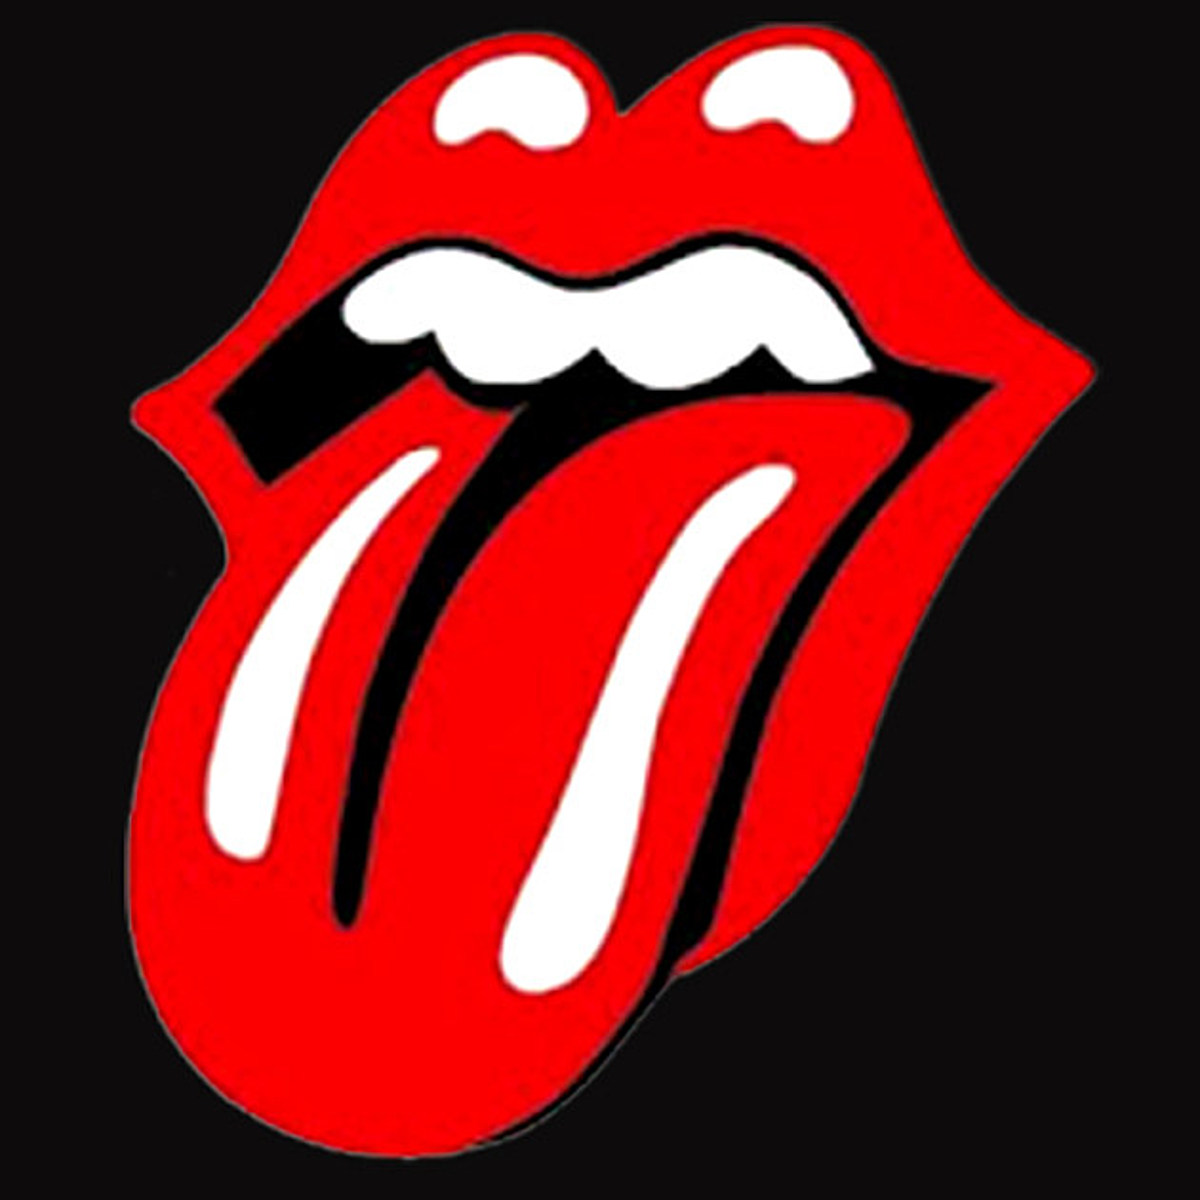 Rolling Stones in Chicago June 21st